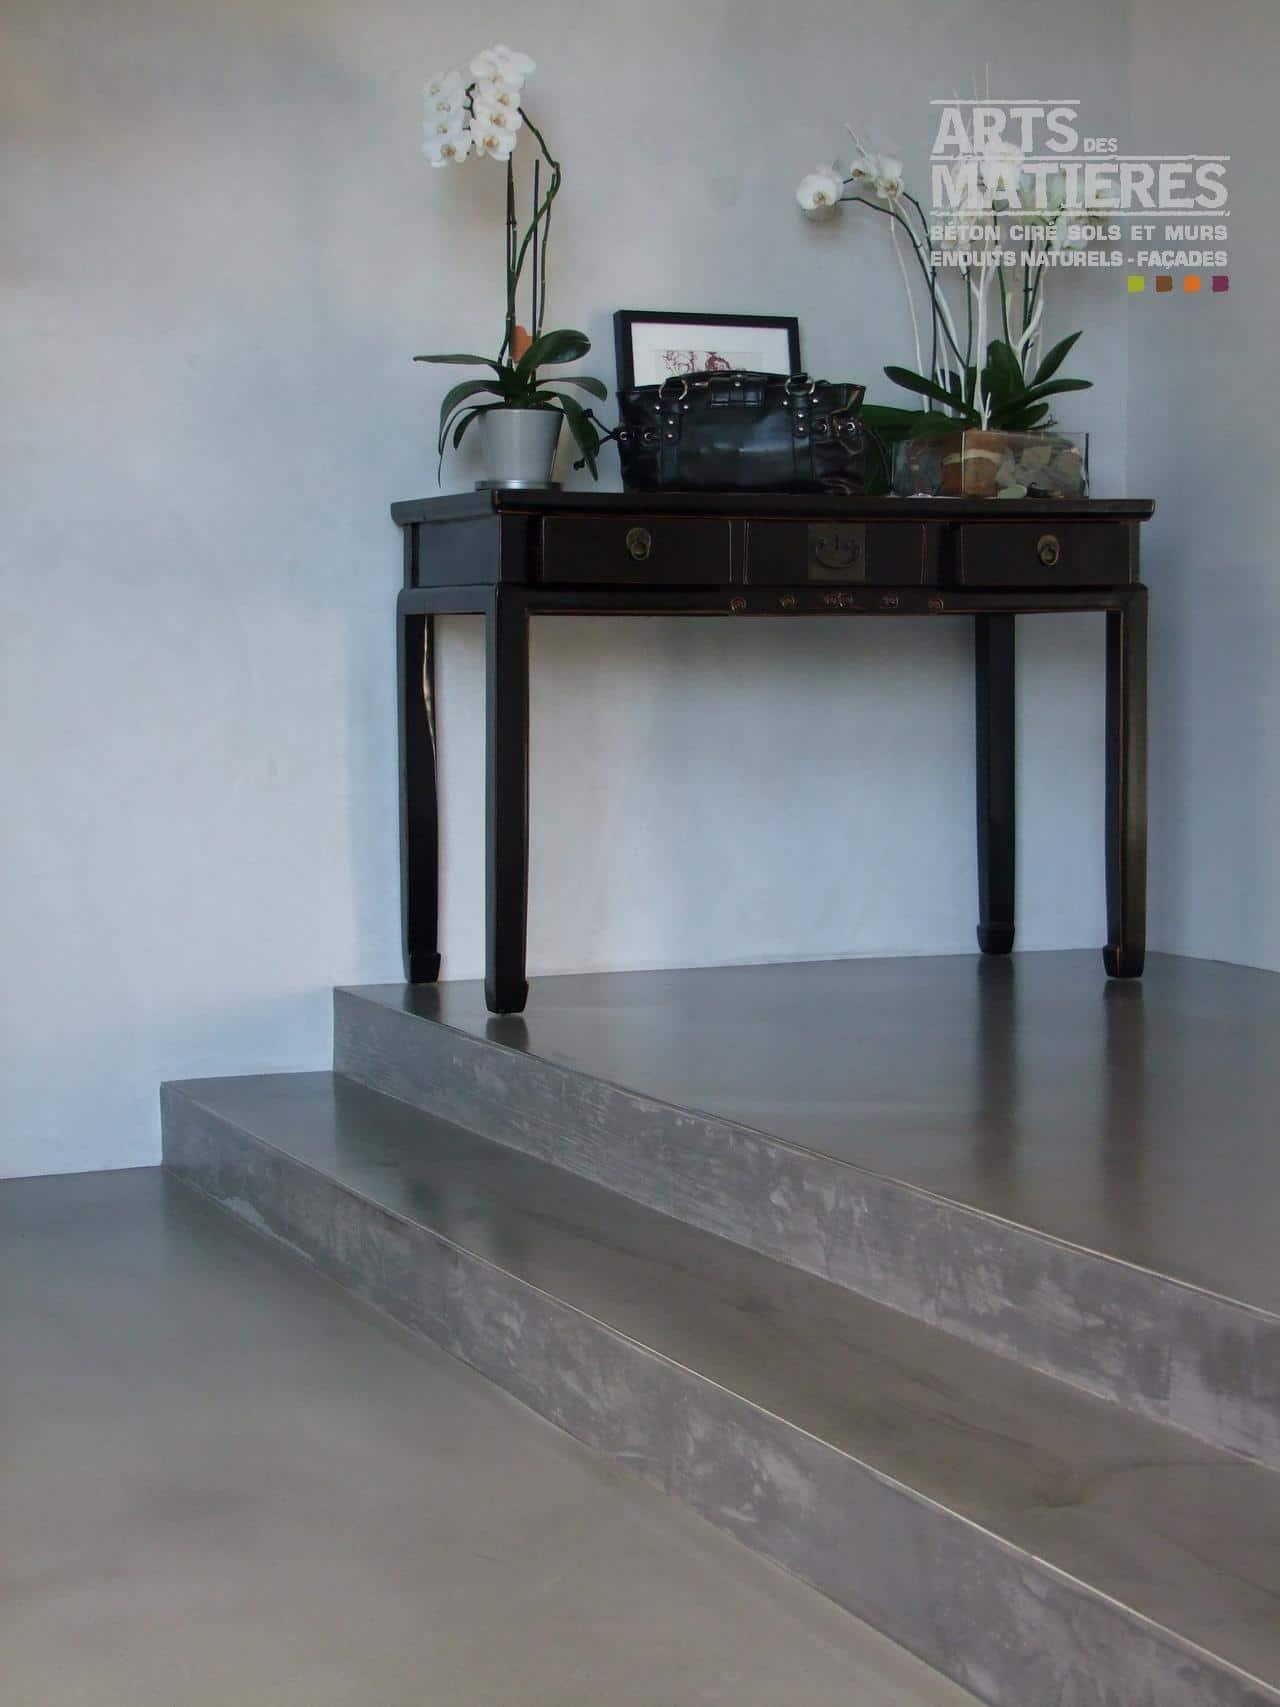 Escalier en b ton cir b ton cir enduits d coratifs naturels by arts des mati res - Beton decoratif toulouse ...